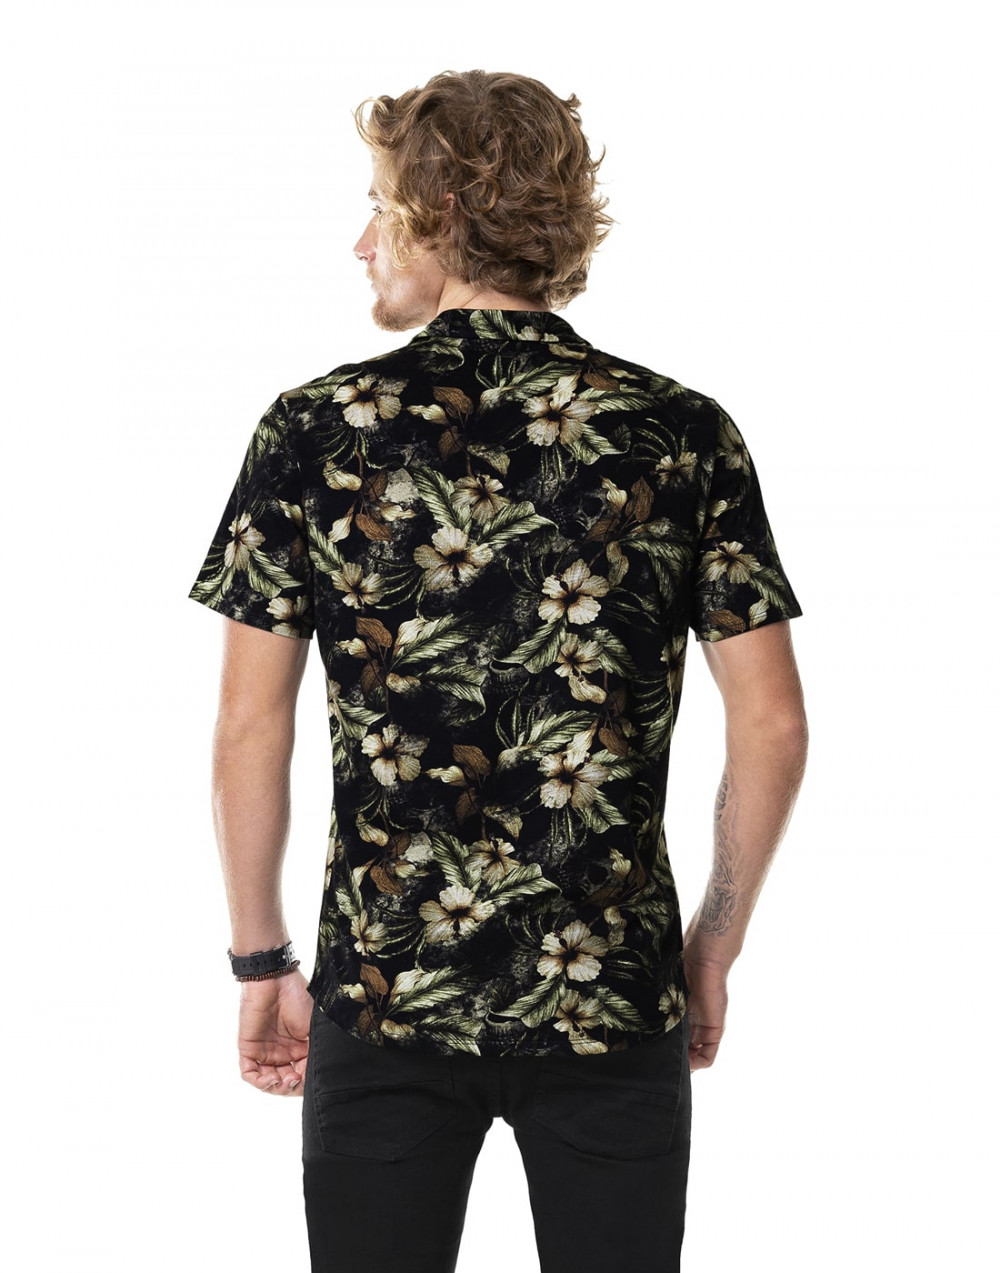 Camisa Manga Curta Meia Malha Estampada Preto Fico